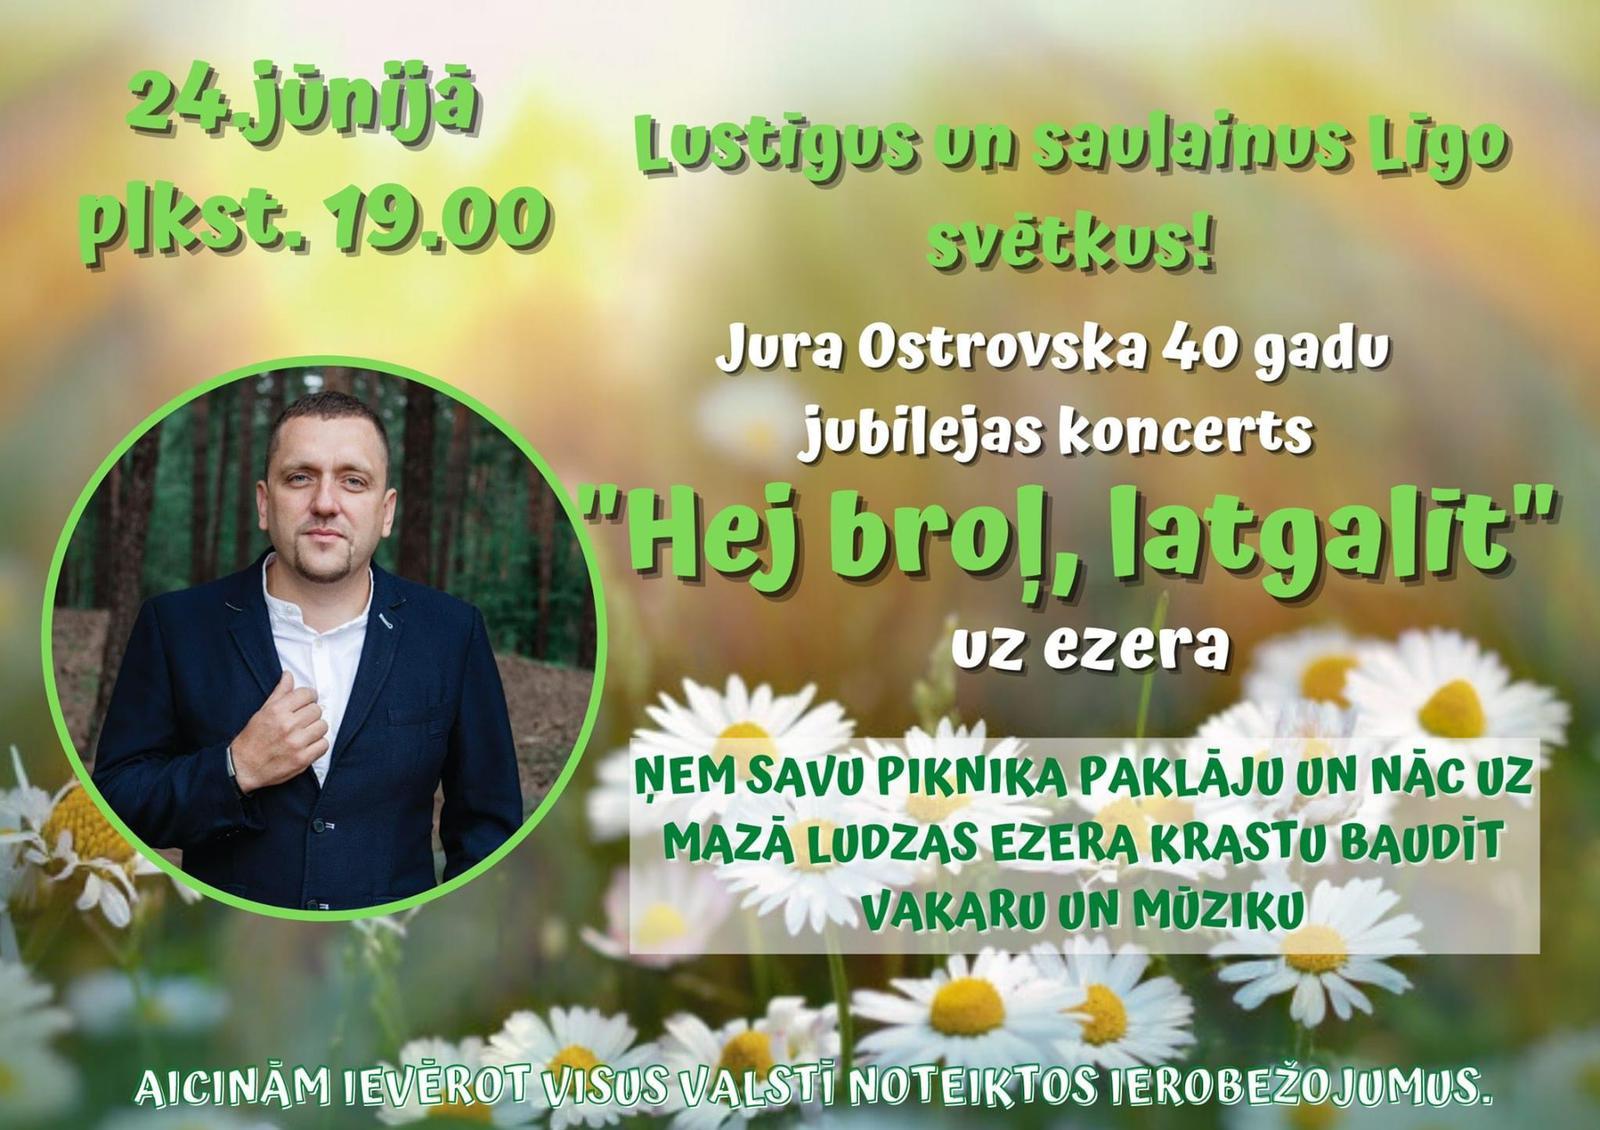 "Jura Ostrovska 40 godu jubilejis koncerts ""Hej, bruoļ, latgalīt"" @ Mozuo Ludzys azara krosts"